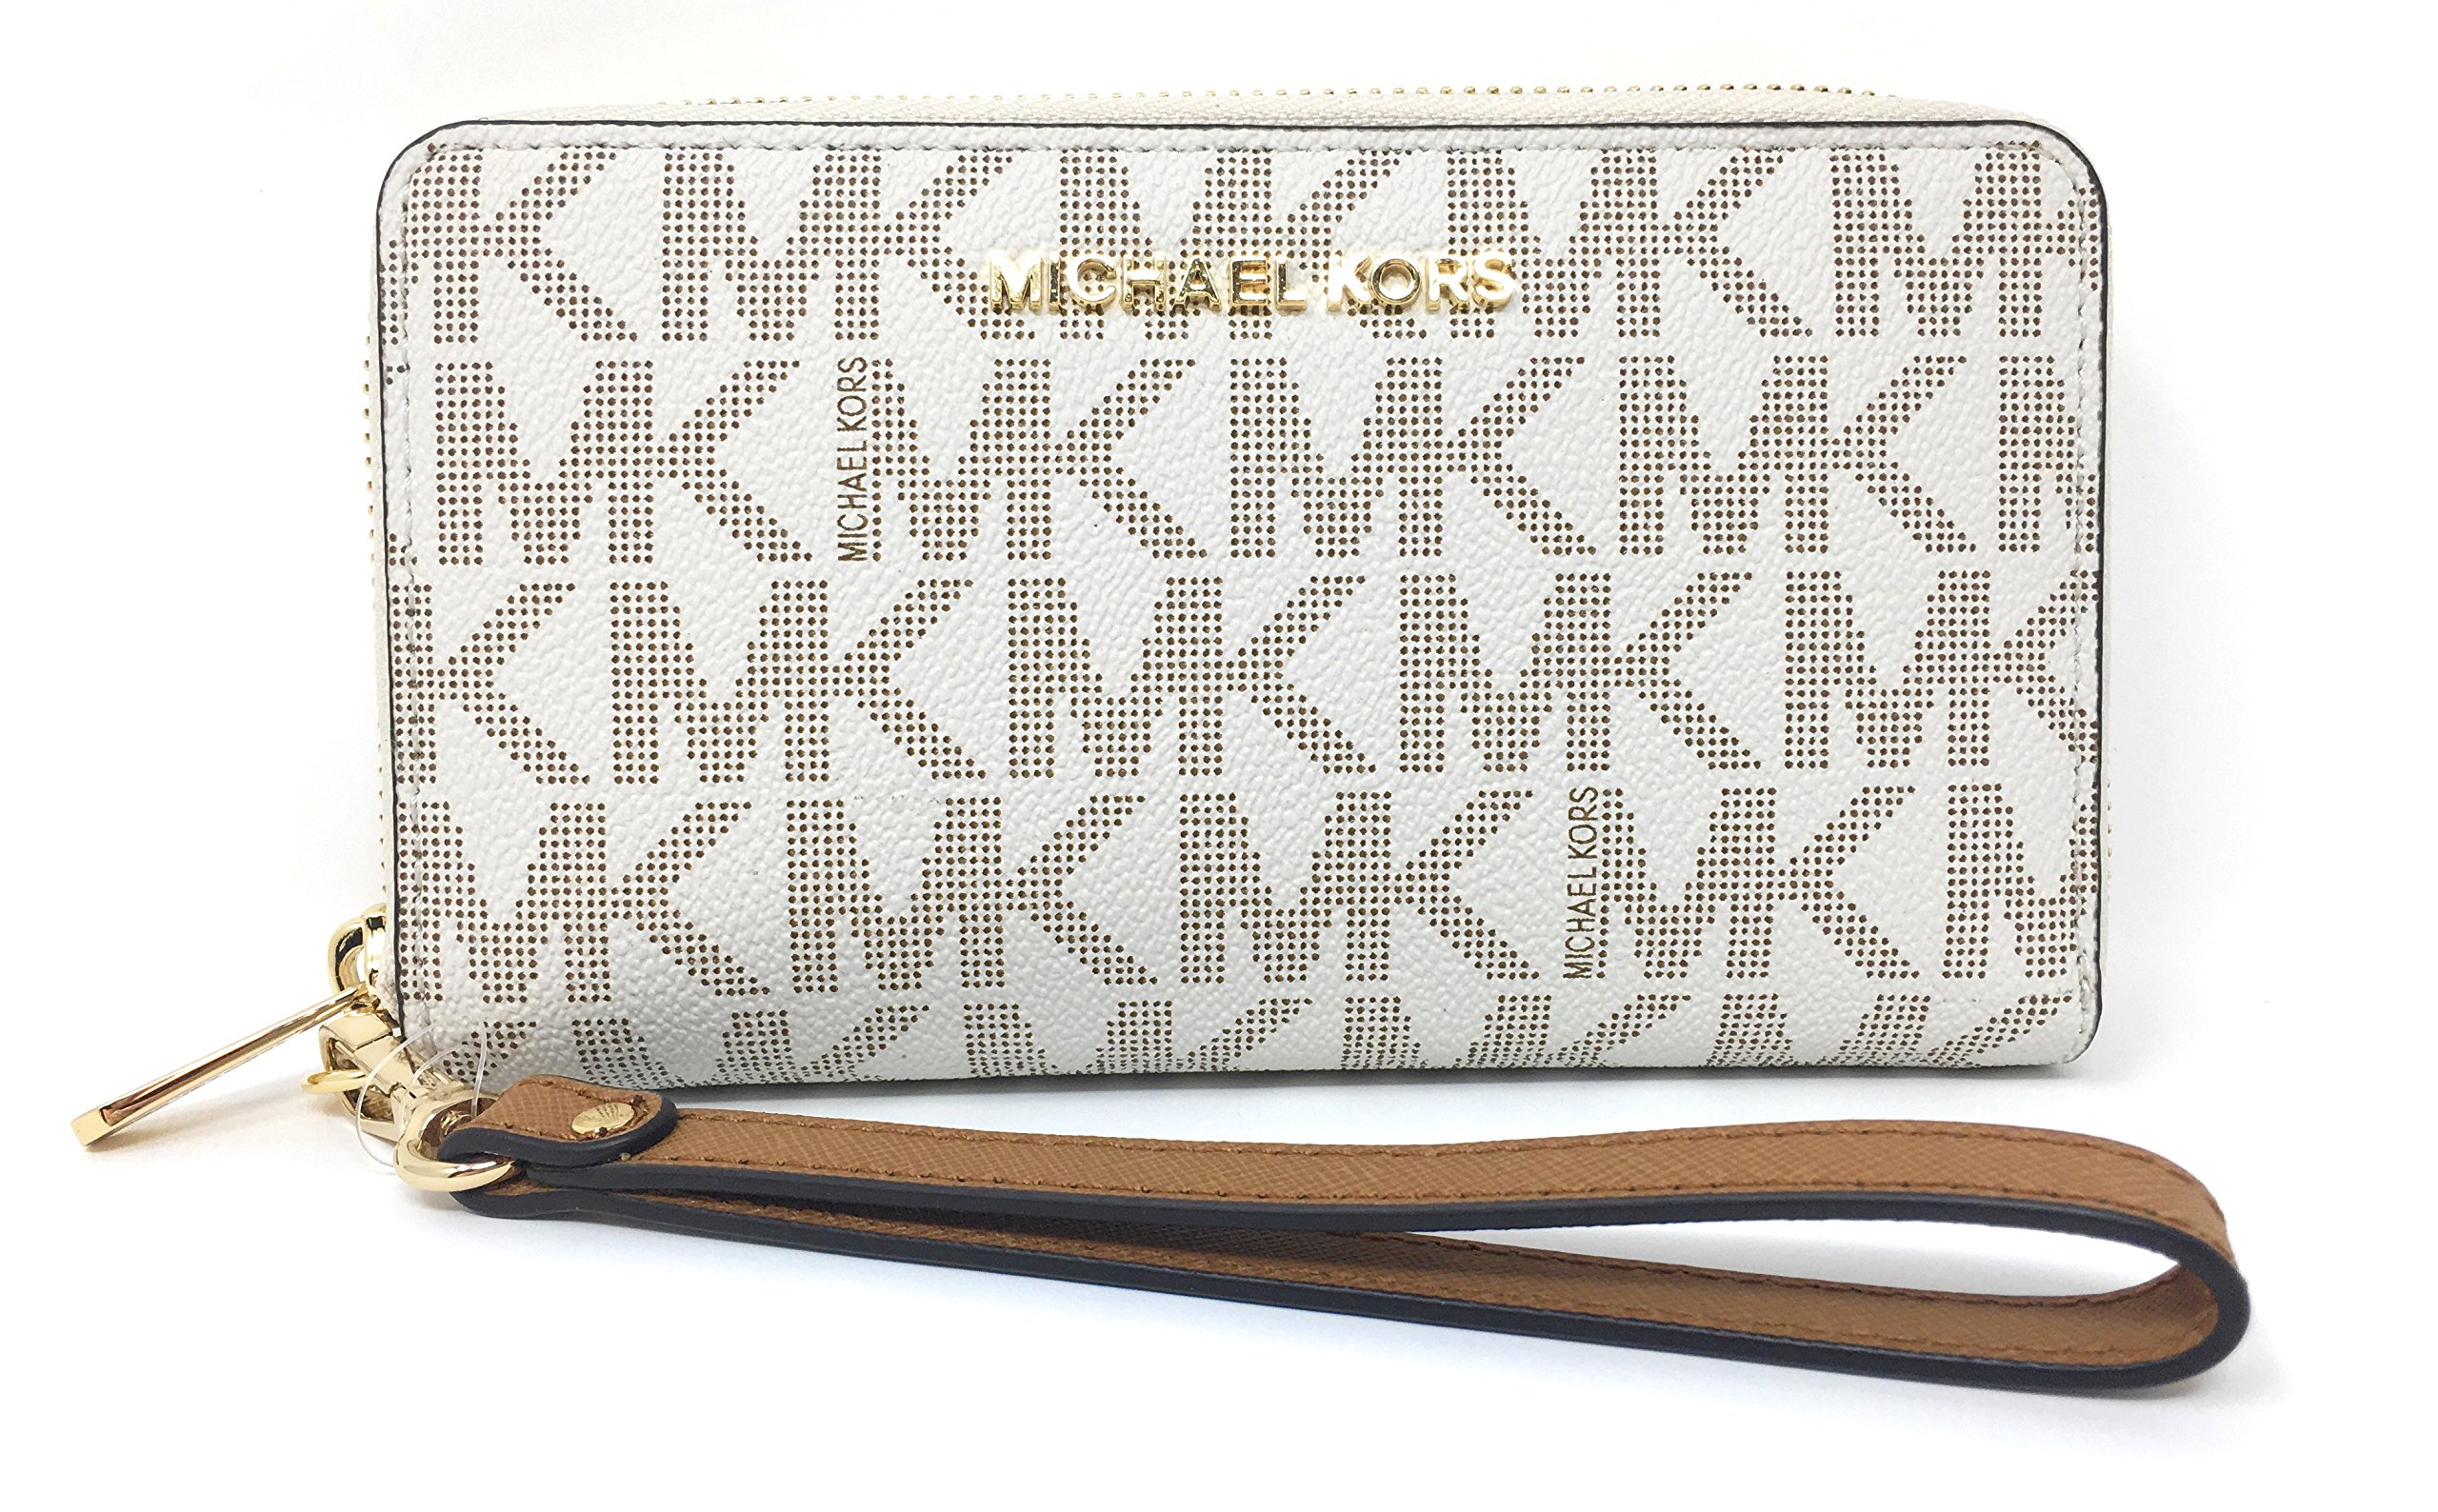 Michael Kors Jet Set Travel Signature PVC Large Flat Multifunction Phone Case Wristlet (Vanilla/Acorn)